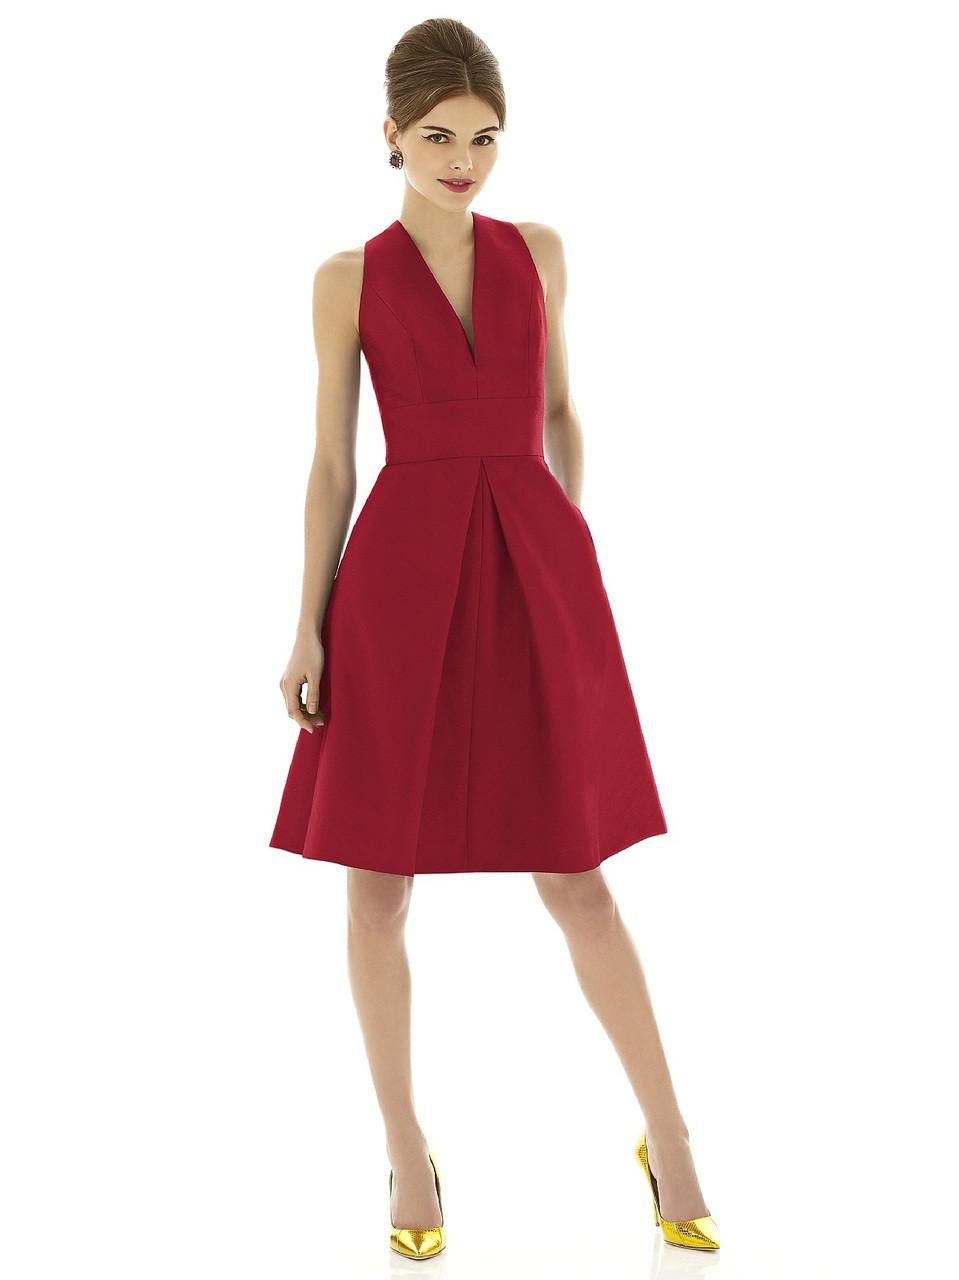 75b3625111f Alfred Sung Style D610 Fabric  Dupioni Cocktail length v-neck dupioni dress  w